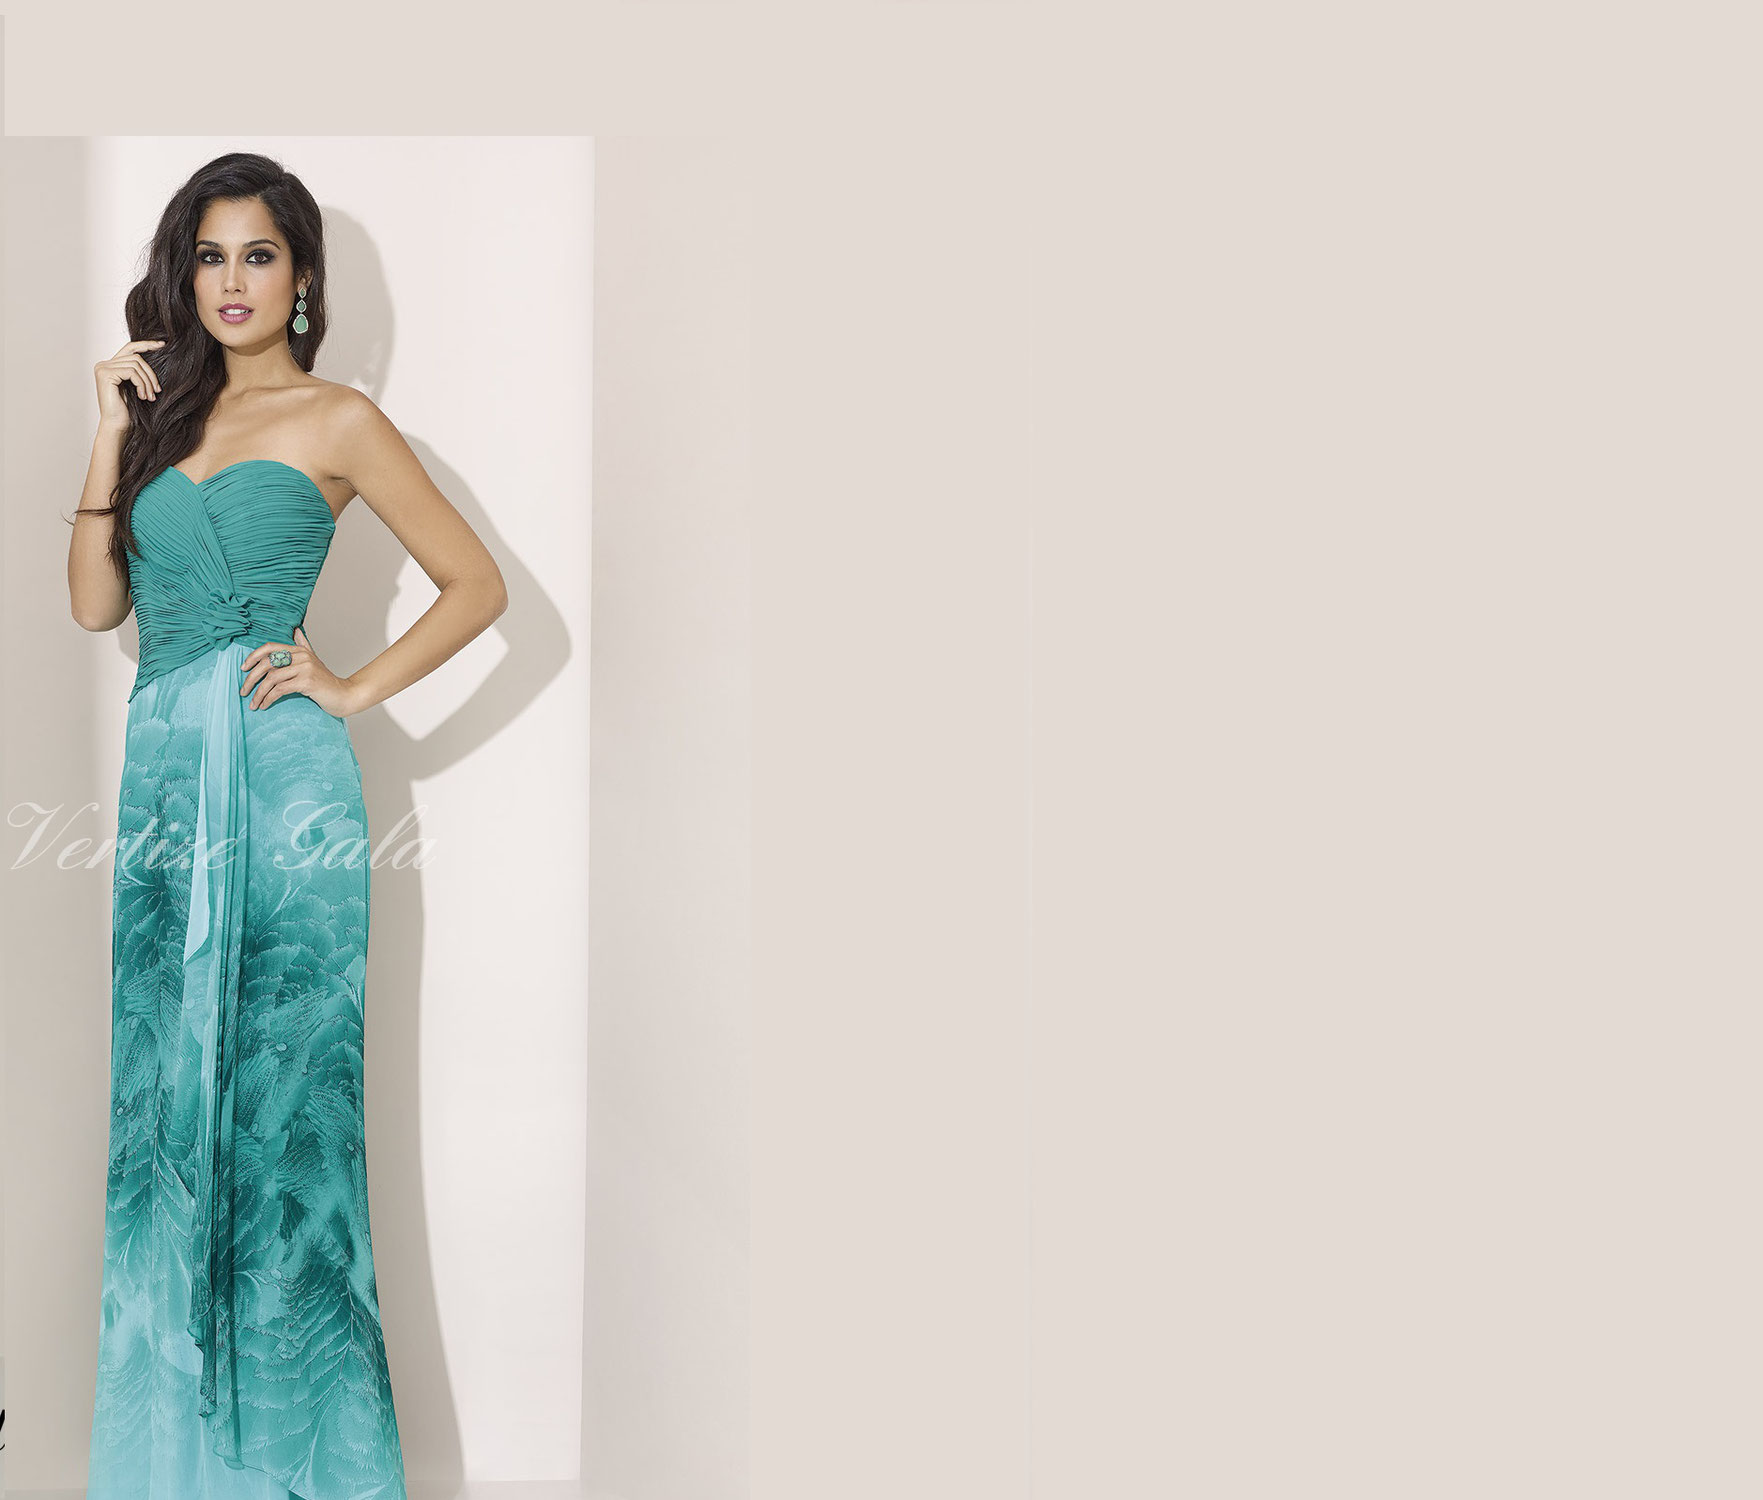 Amaral Modas Exclusivos Chaqués Vestidos Jerez De En Alquiler wPxHT8qn